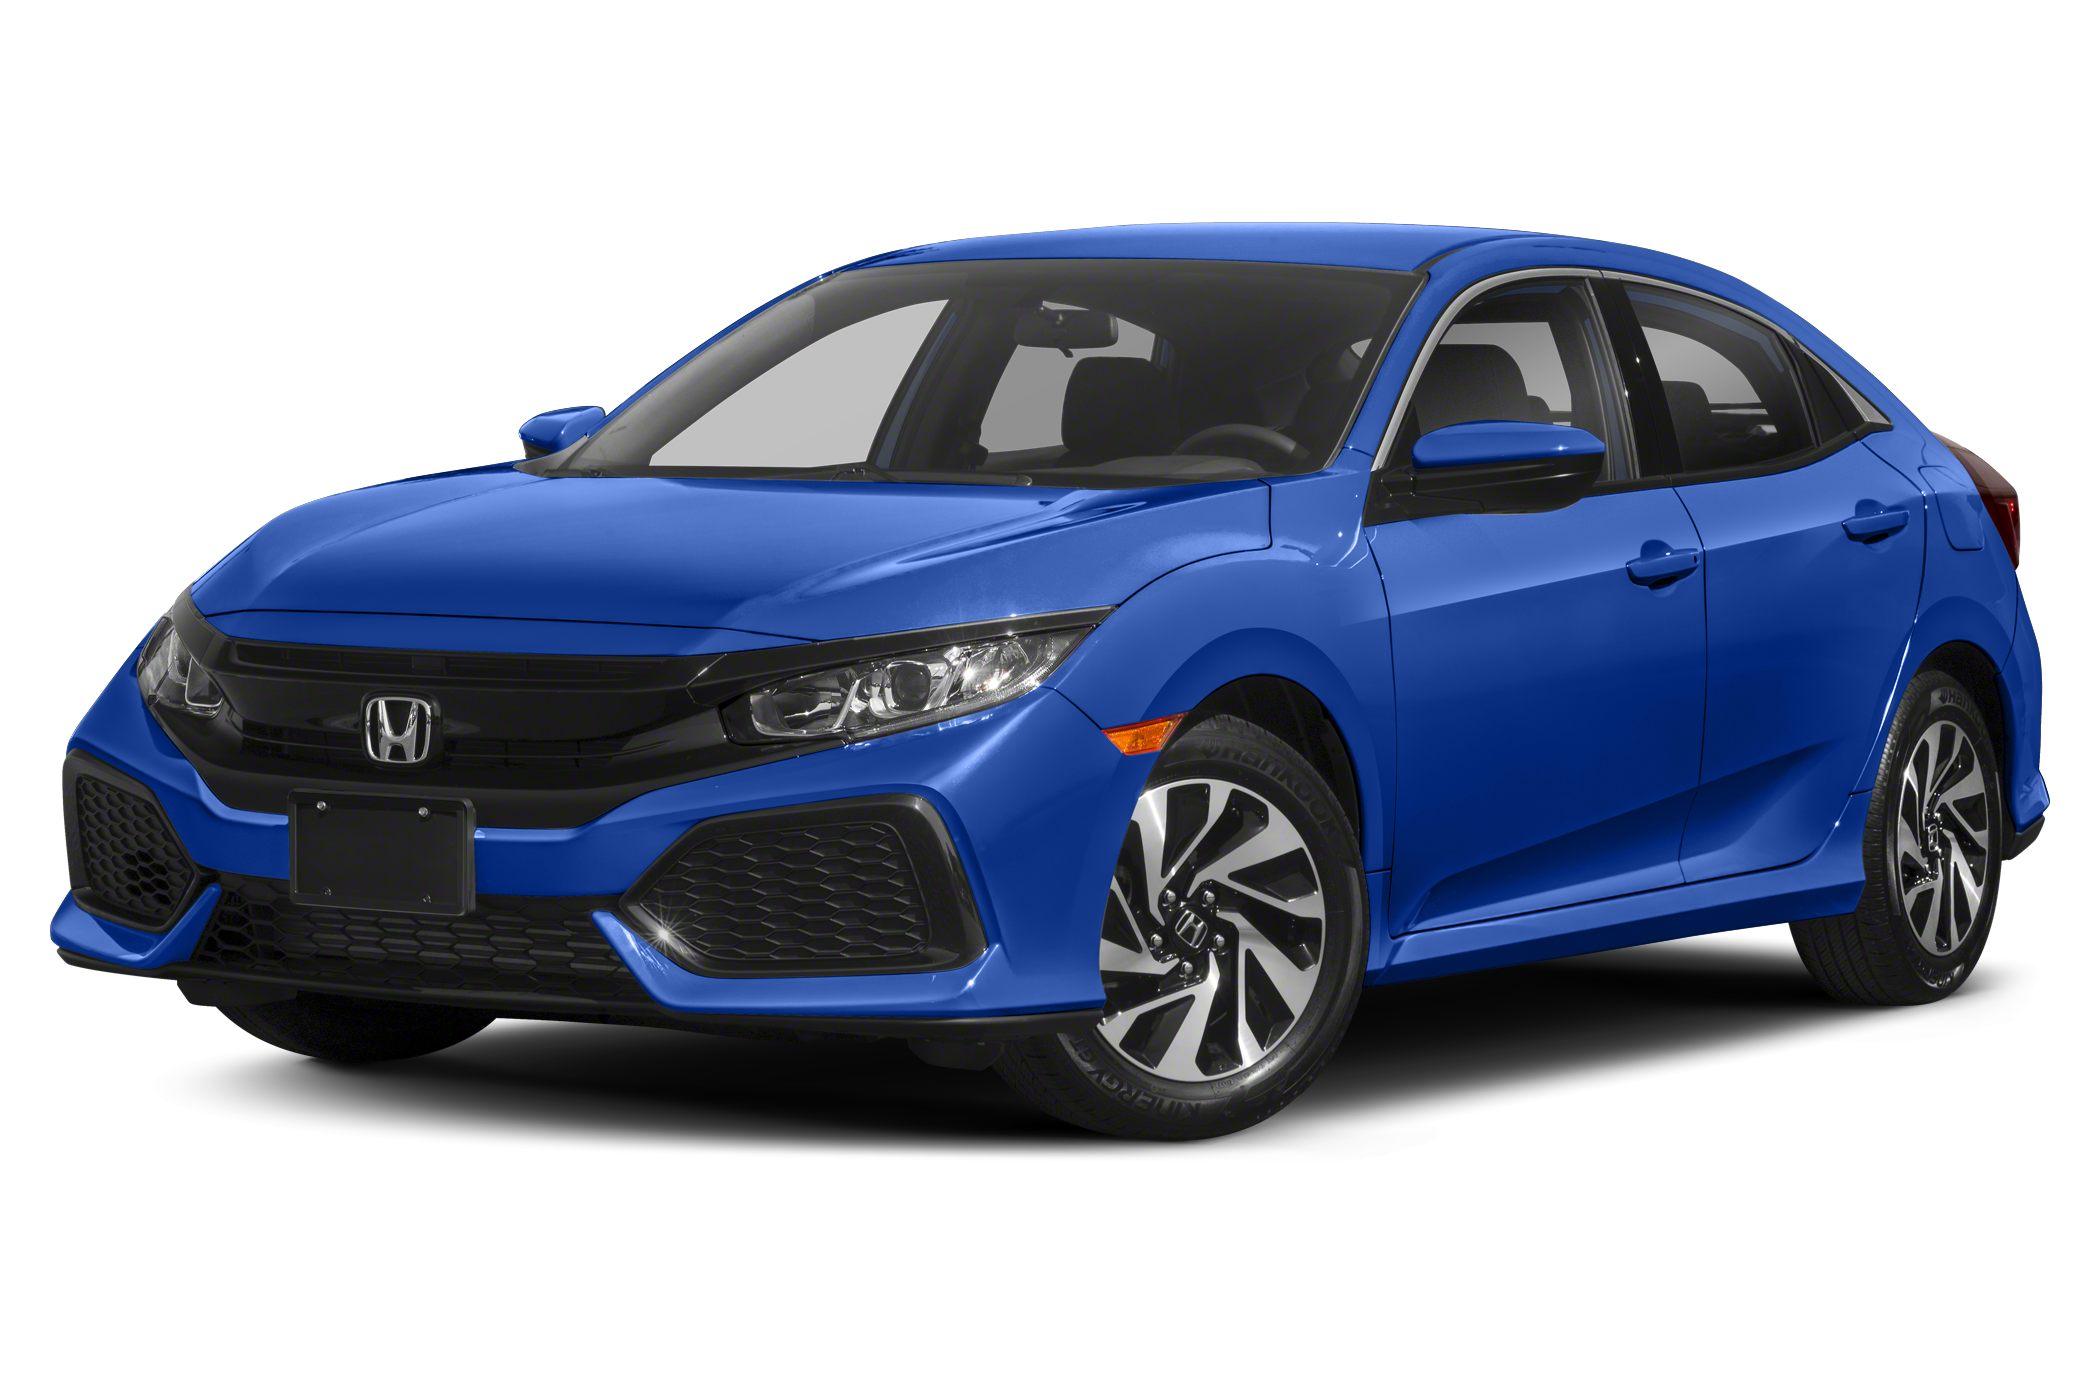 2018 Honda Civic LX 4dr Hatchback